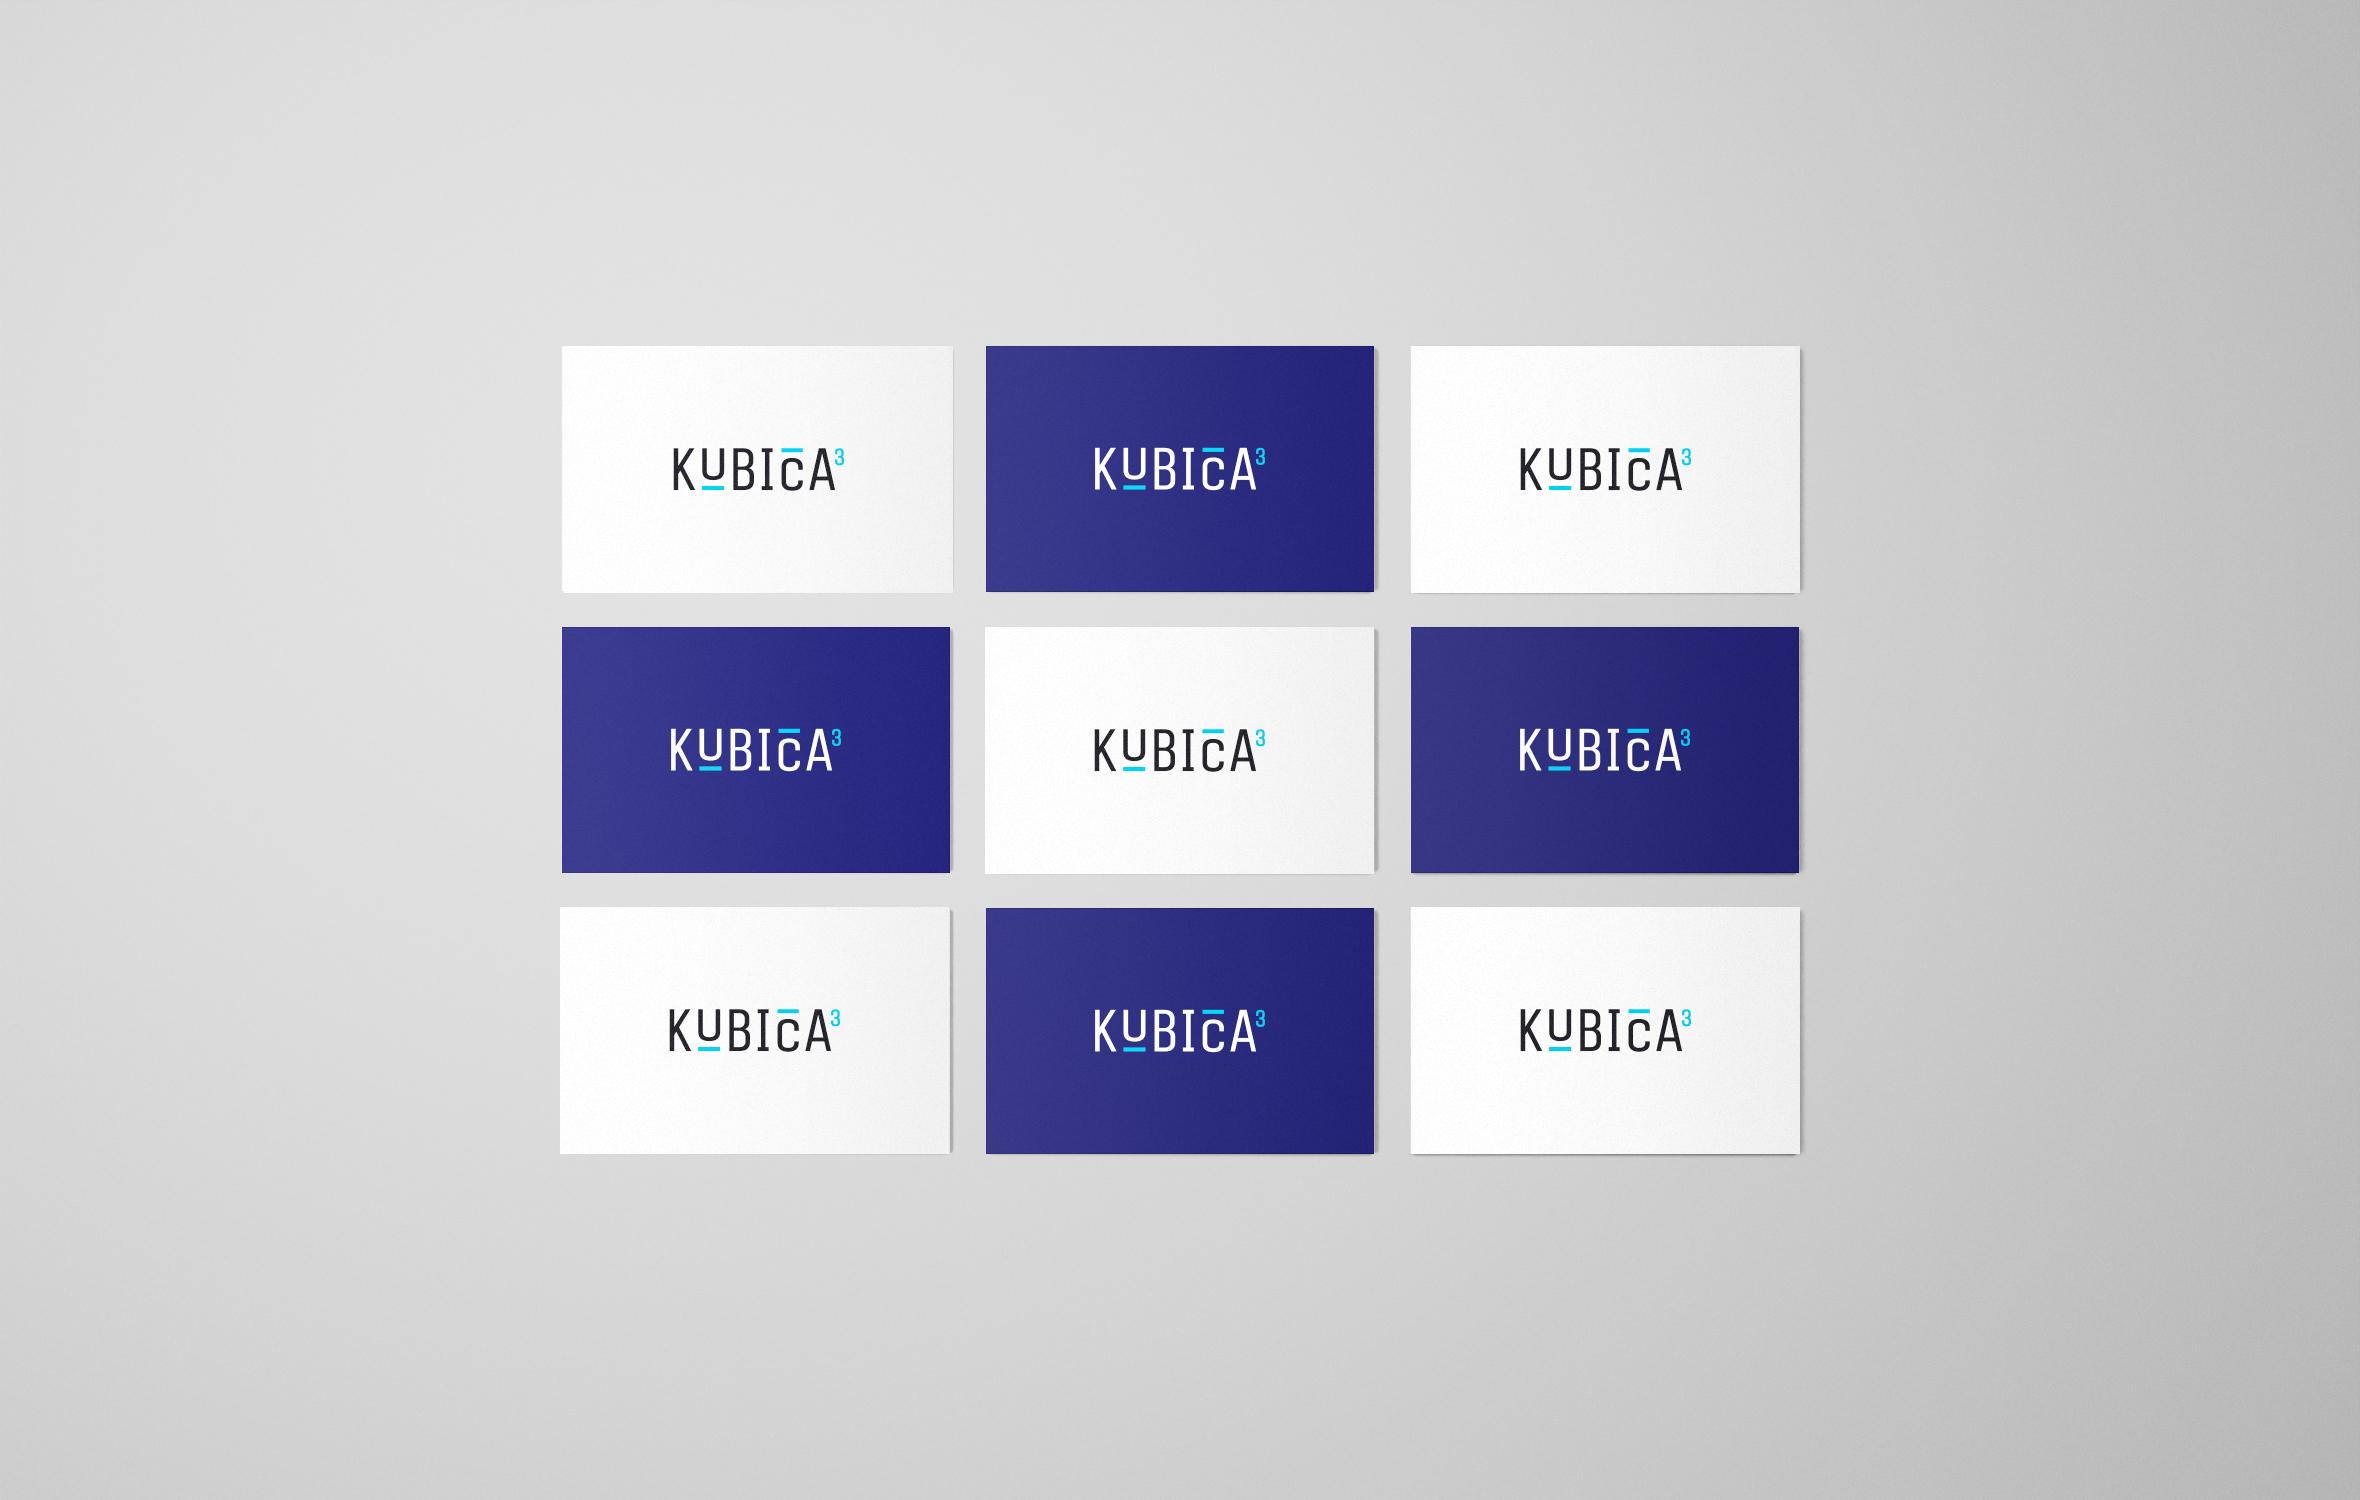 Projet Immobilier Kubica - Papeterie- Bivouac Studio